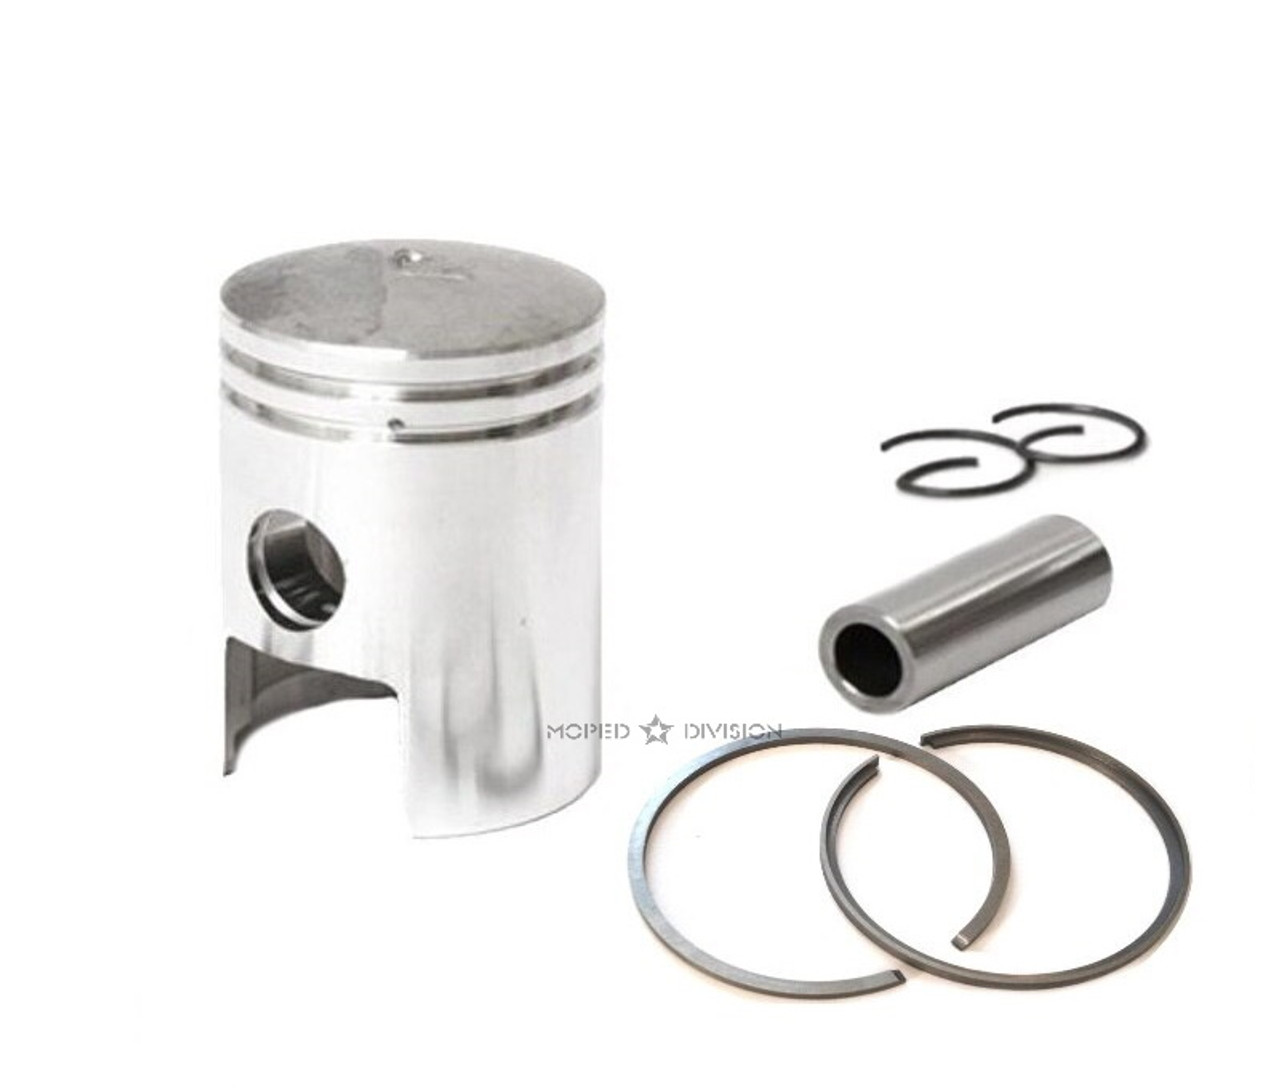 Piaggio Vespa Kinetic 38.4mm Stock Piston Kit - 12mm Wrist Pin